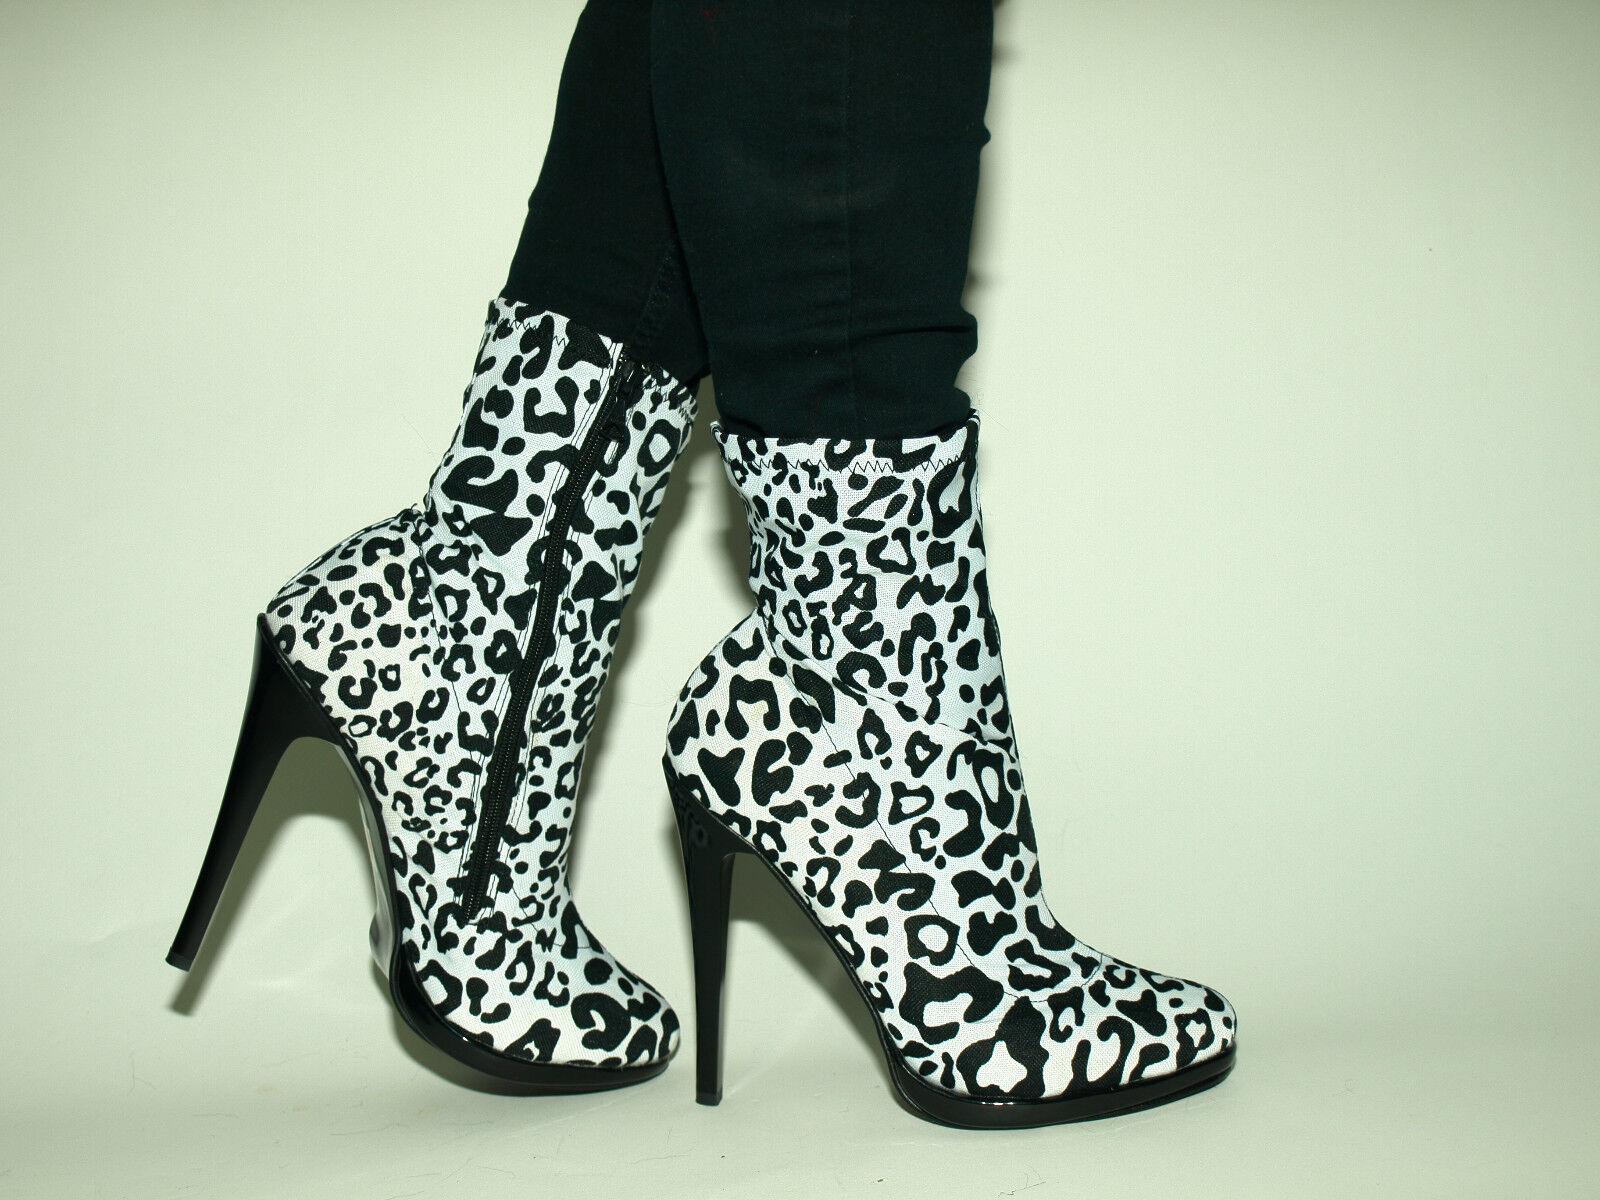 Highs heels piel sintética 14cm 37 38 39 40 41 42 43 44 45 46 47 bolingier